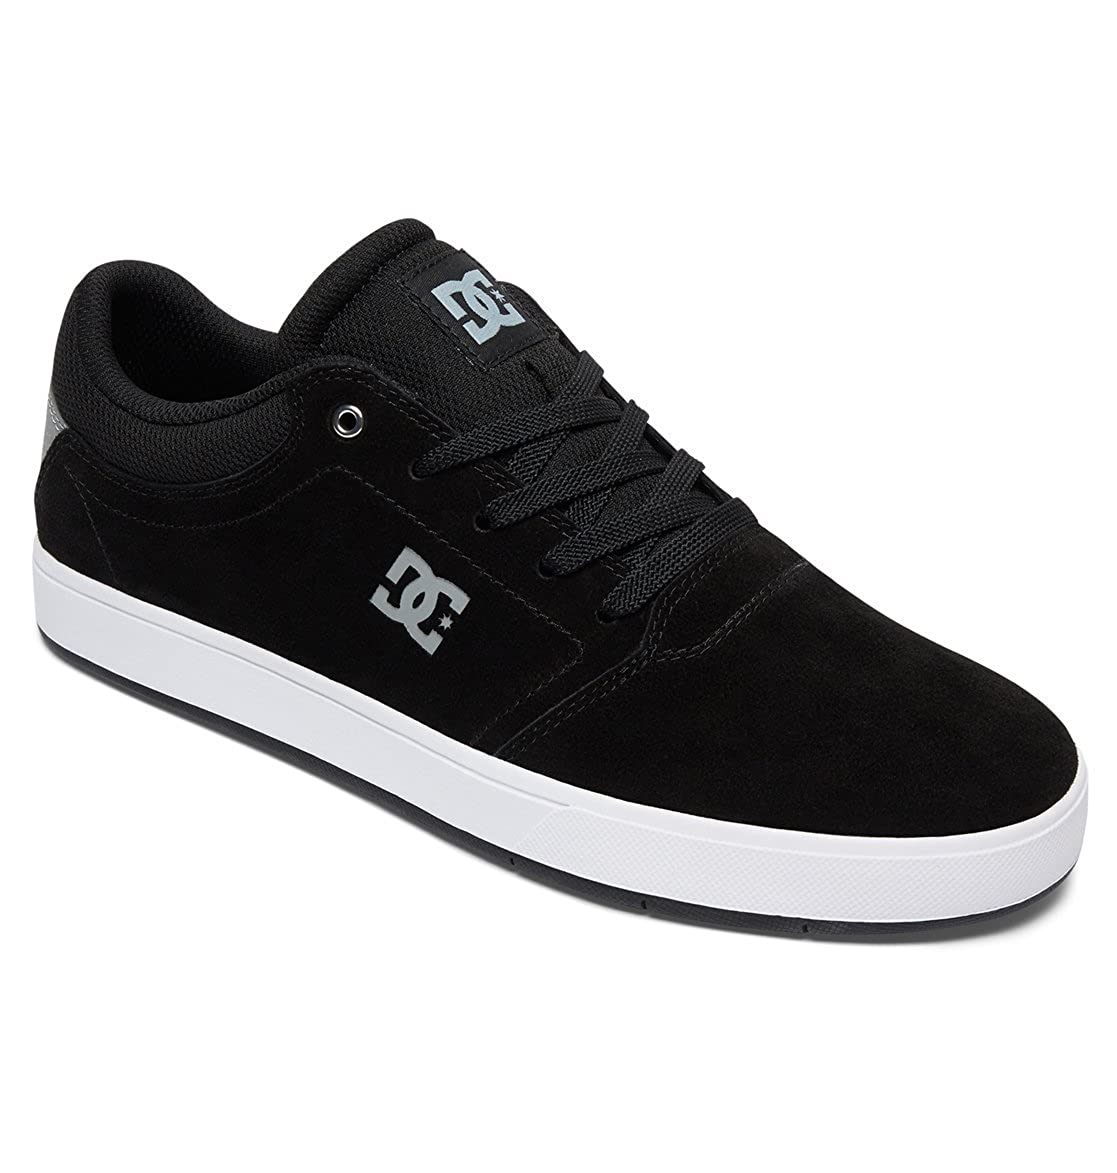 DC CRISIS Herren Skateboardschuhe    012257